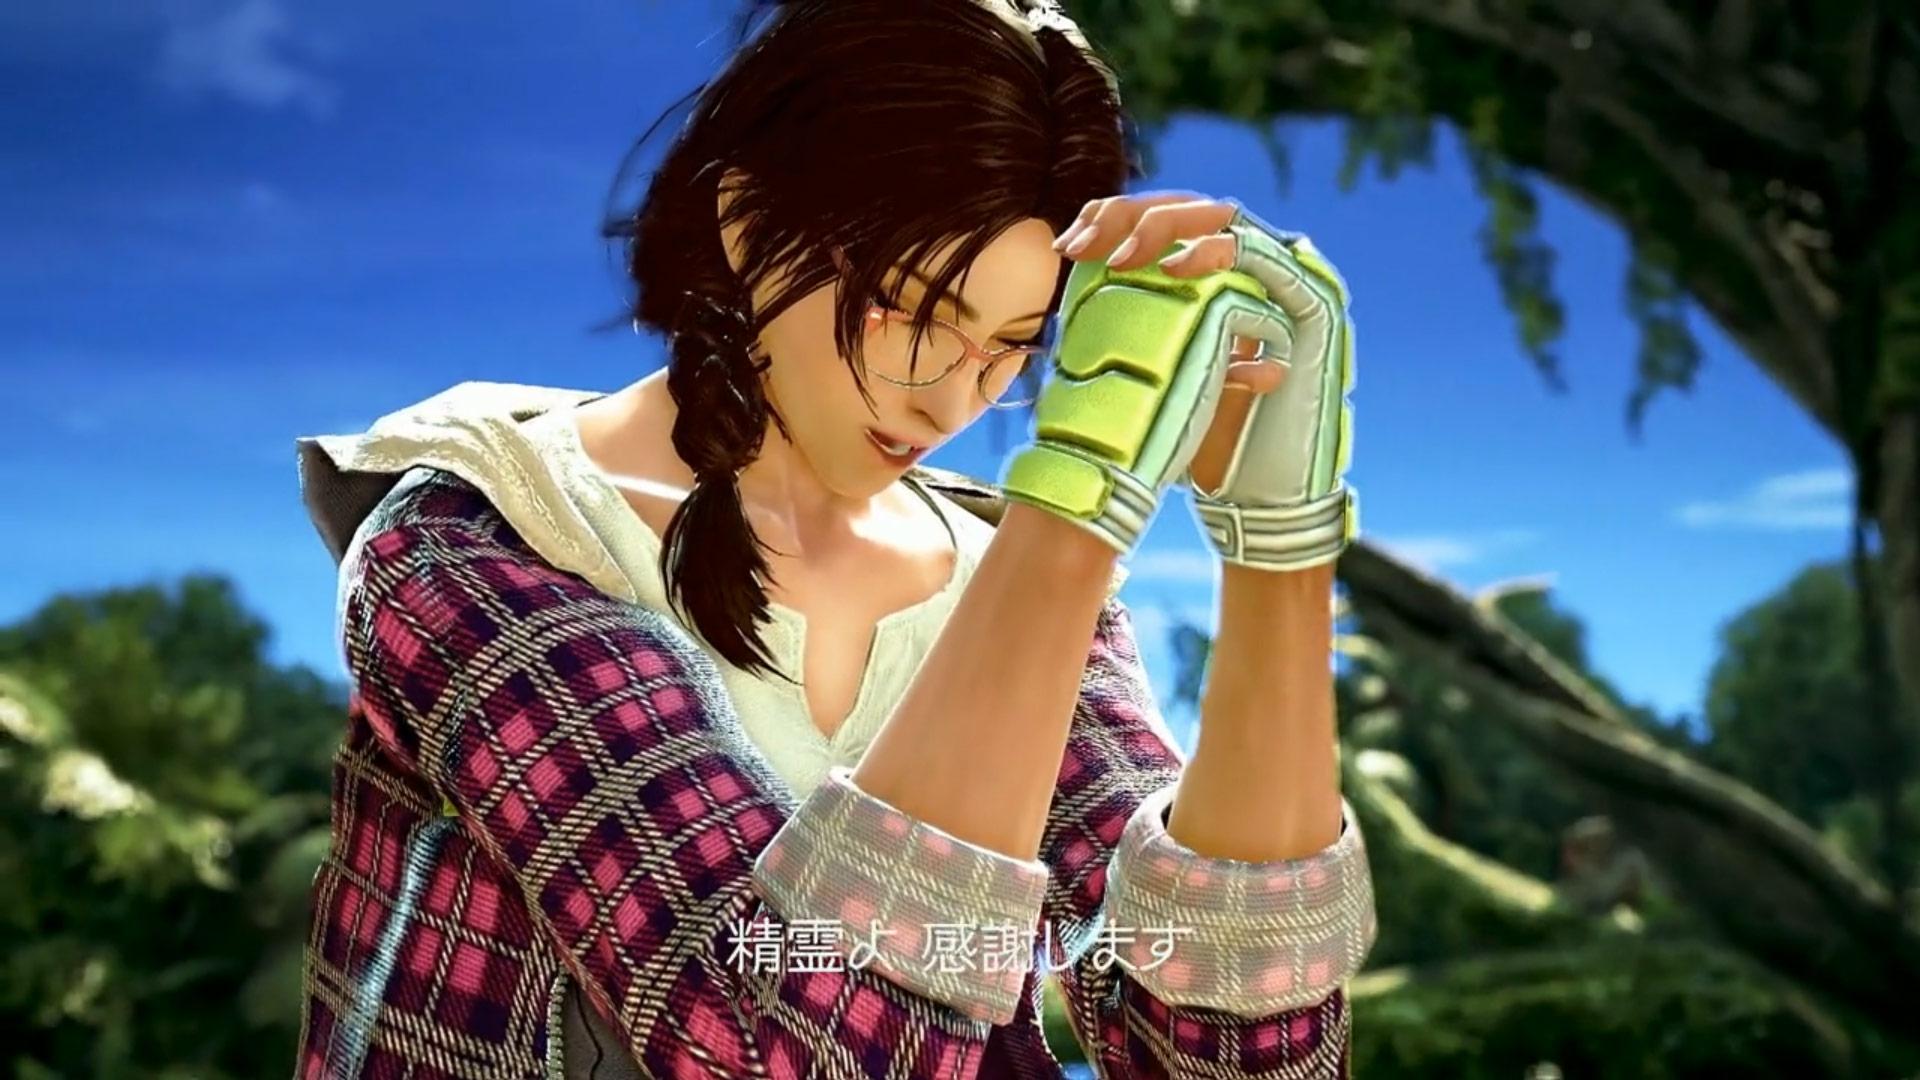 Tekken 7 Julia and Negan Reveal Screenshots 3 out of 12 image gallery